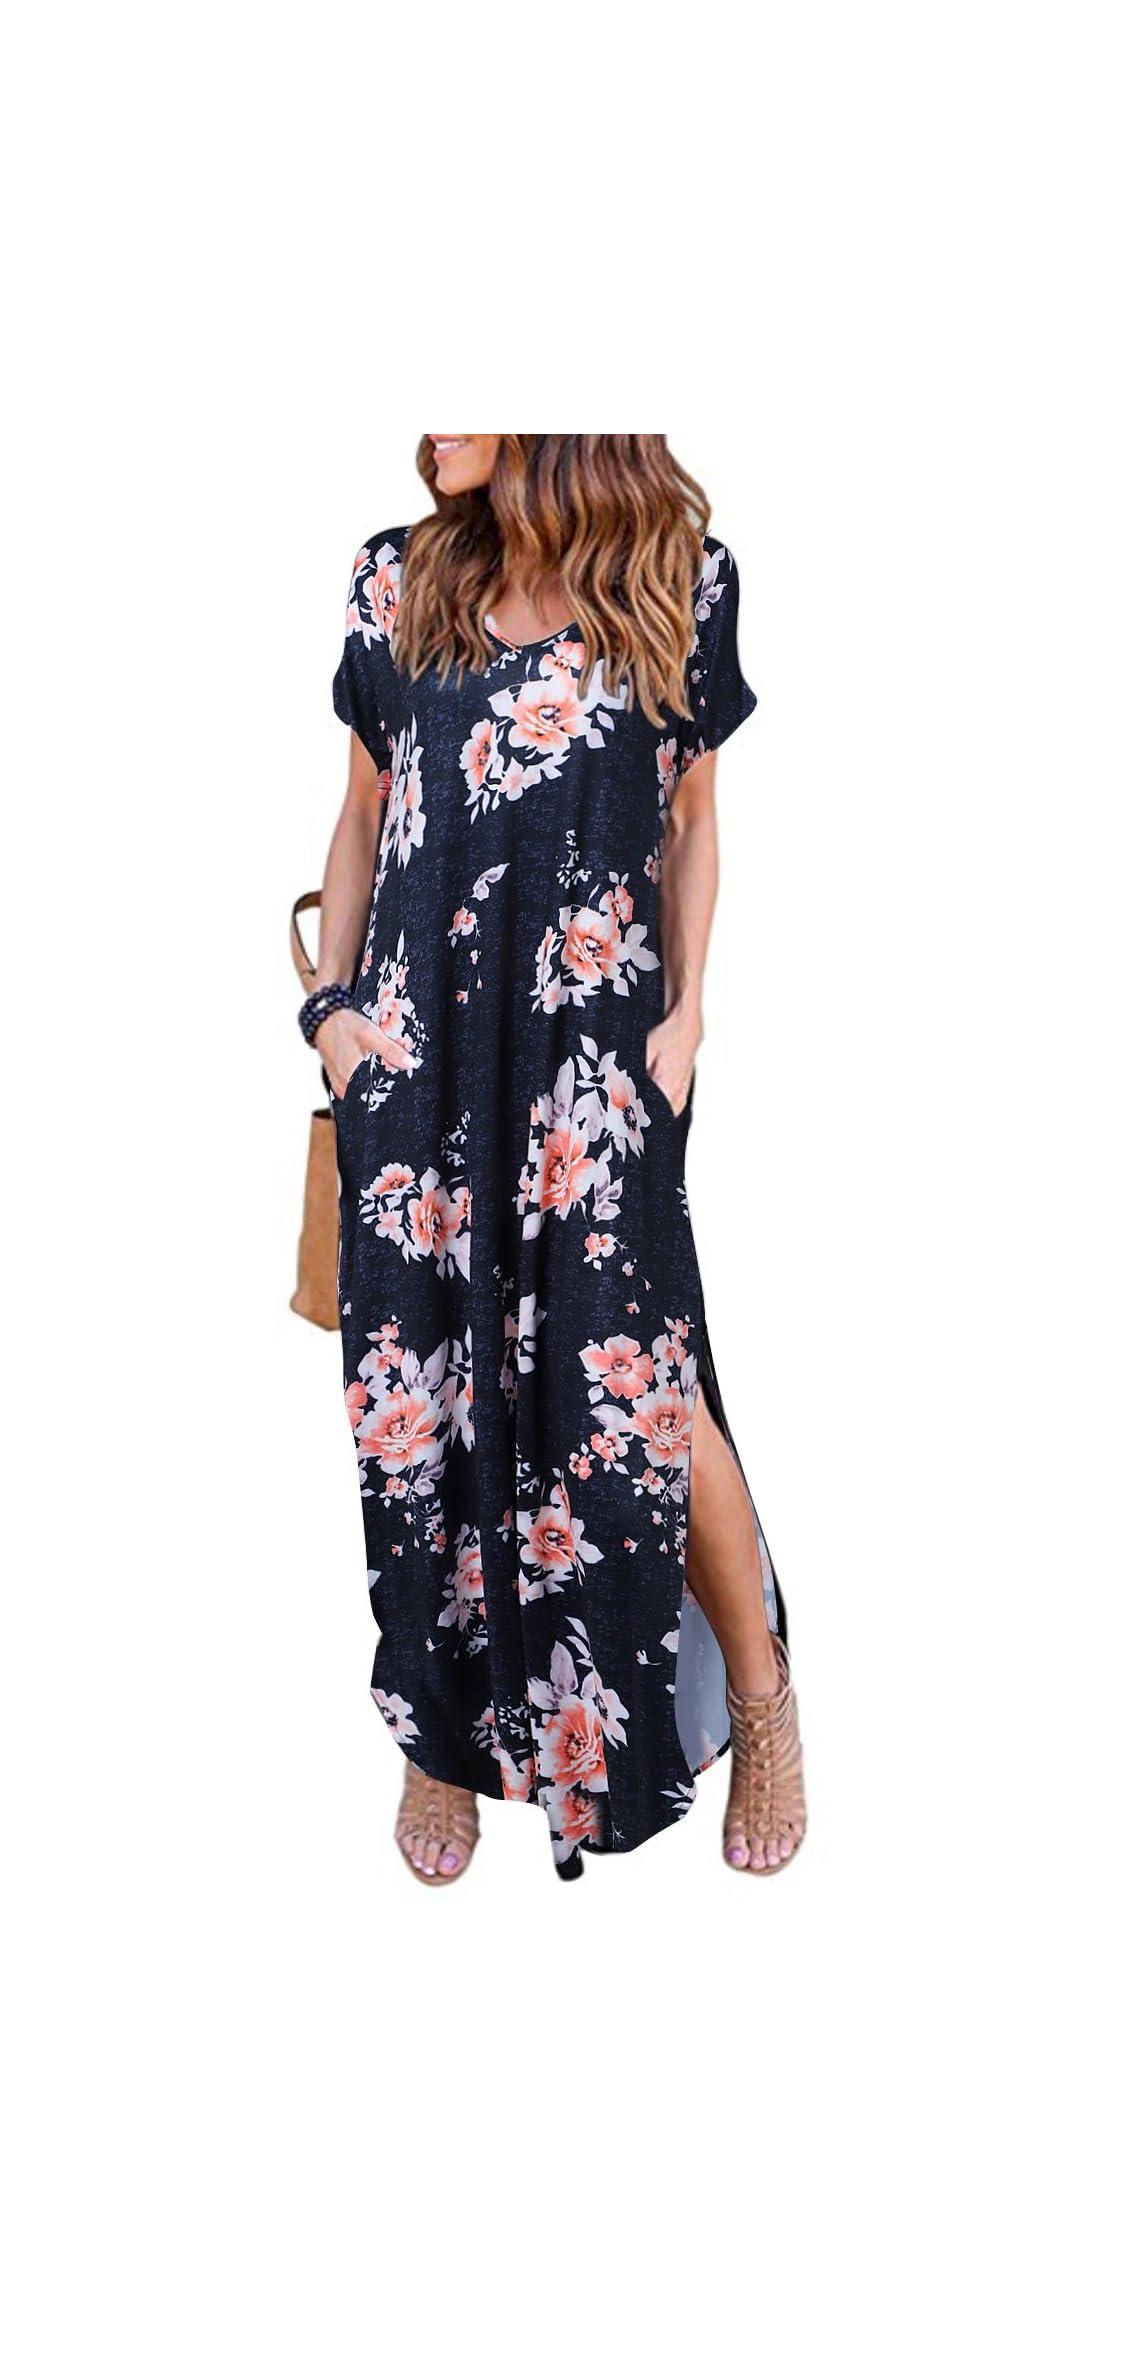 Women's Summer Maxi Dress Casual Loose Pockets Long